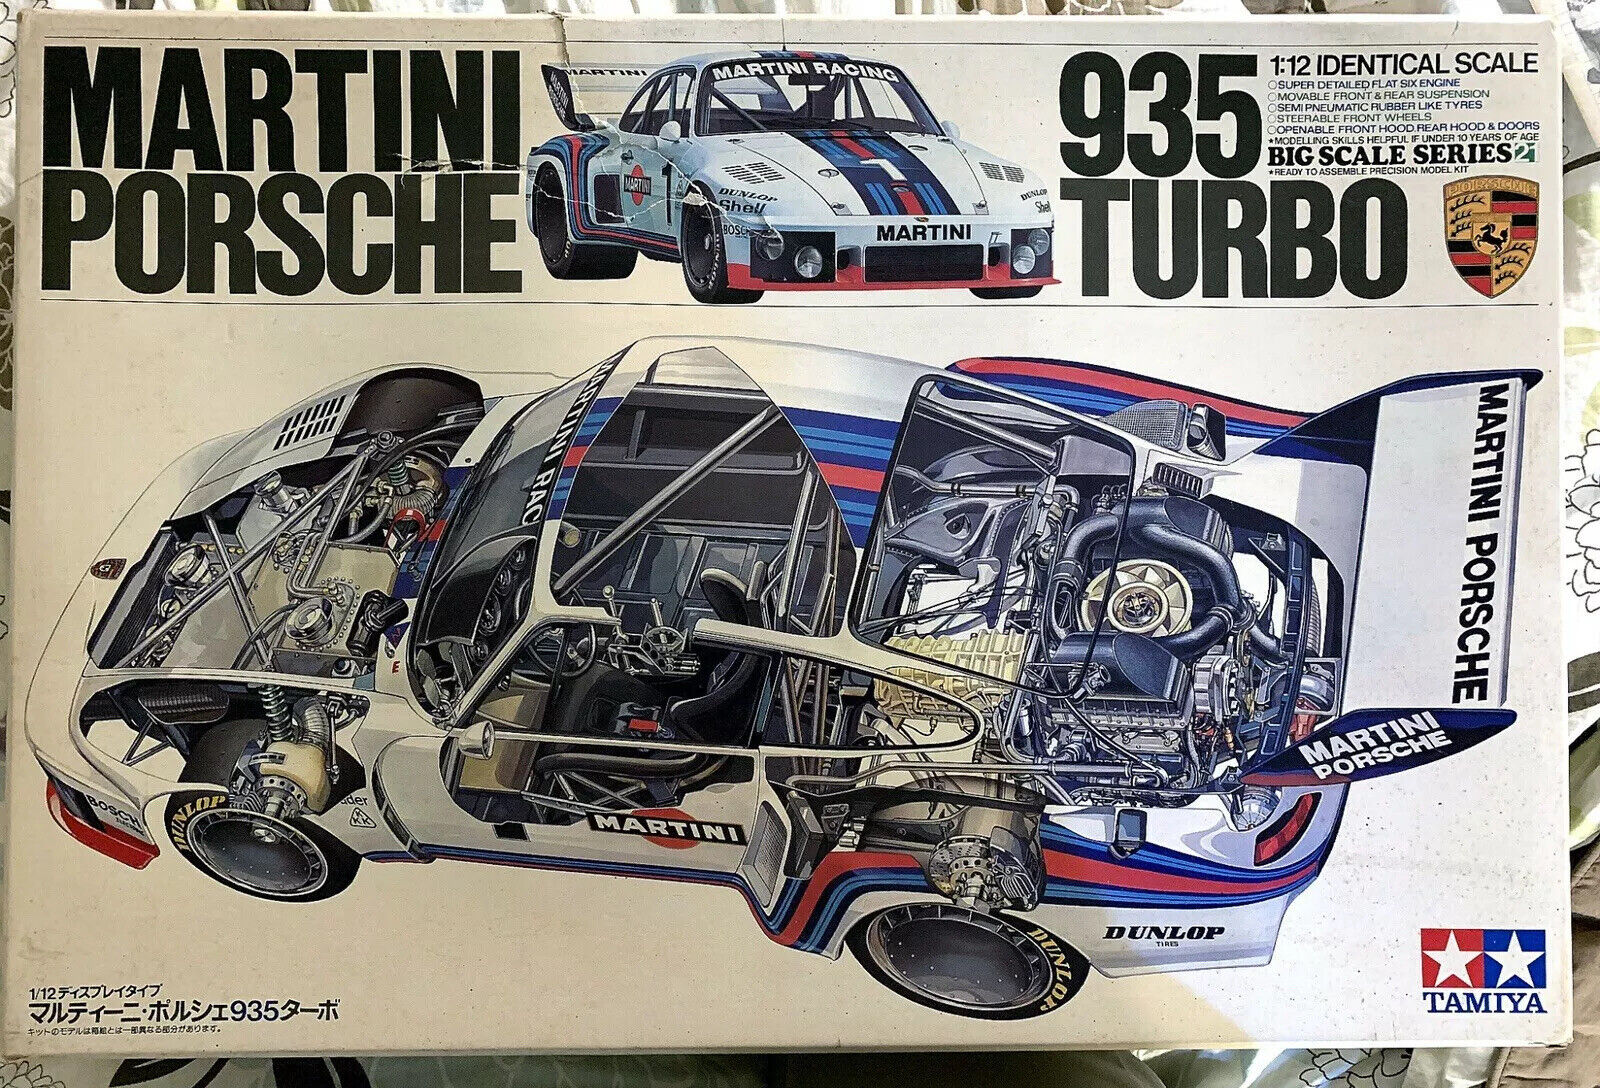 Tamiya 1 12 Martini Porsche 935 Turbo Model Kit Bs1223 For Sale Online